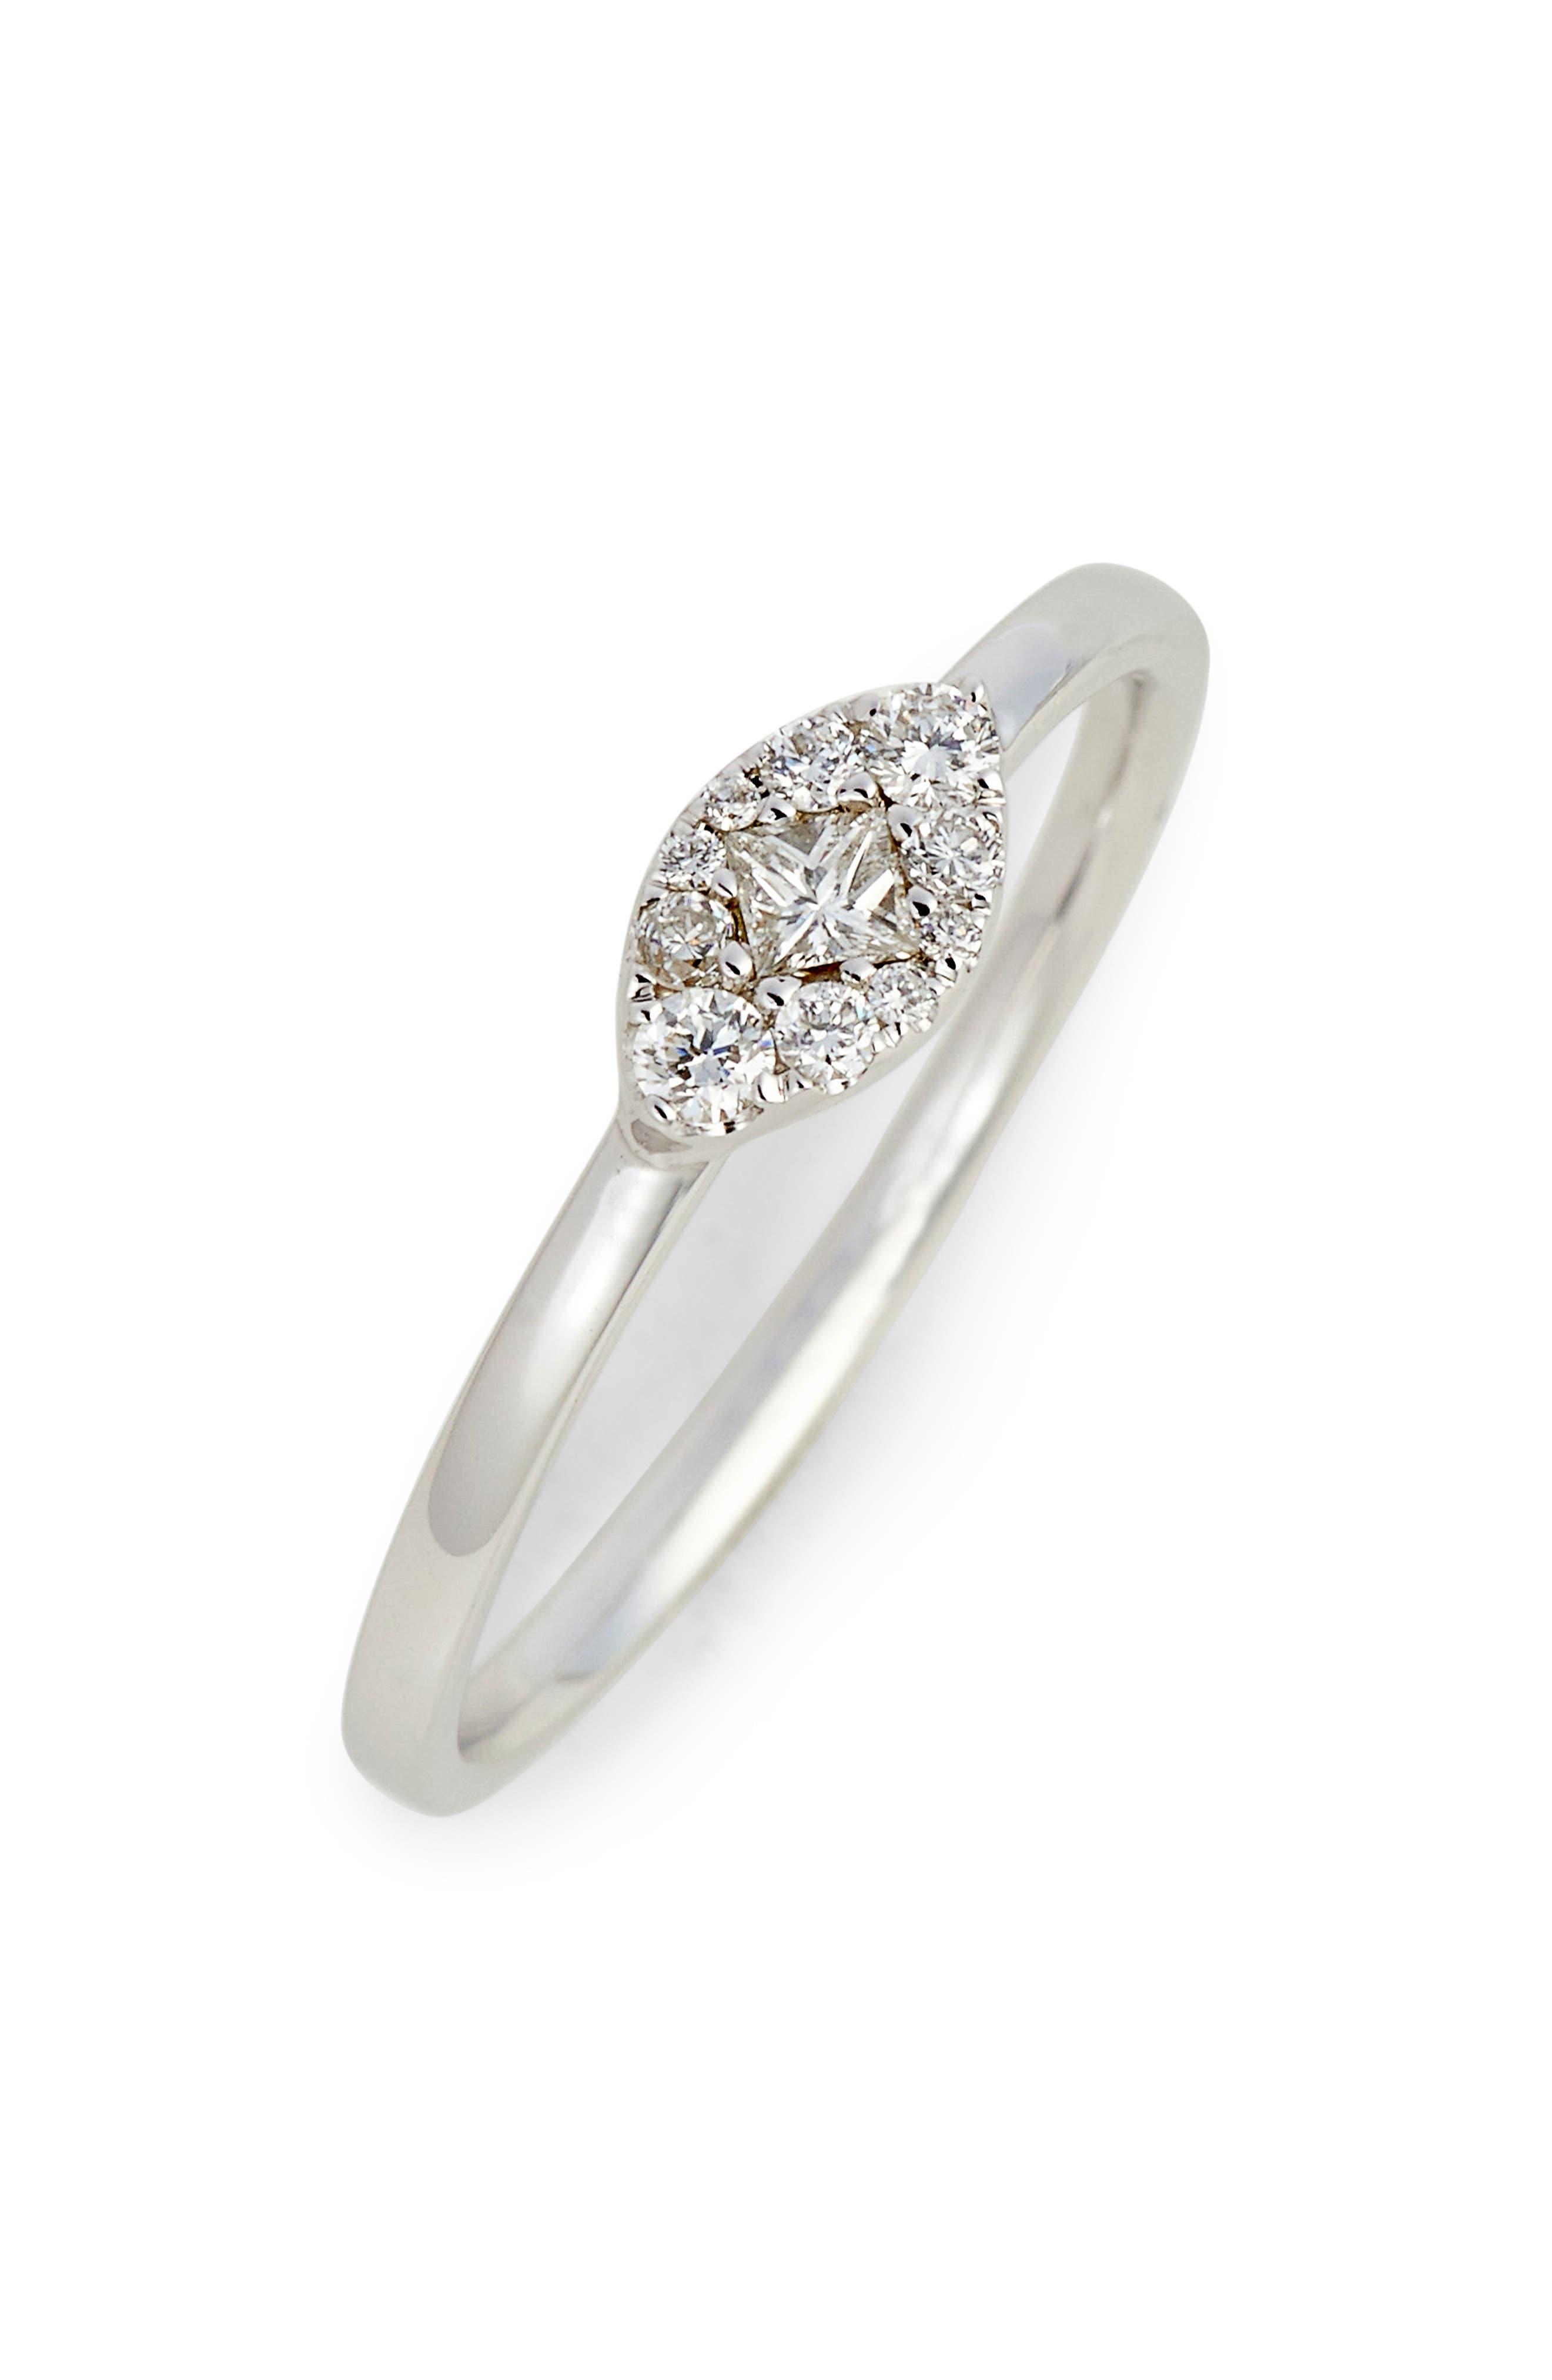 Main Image - Bony Levy Mika Marquise Diamond Stacking Ring